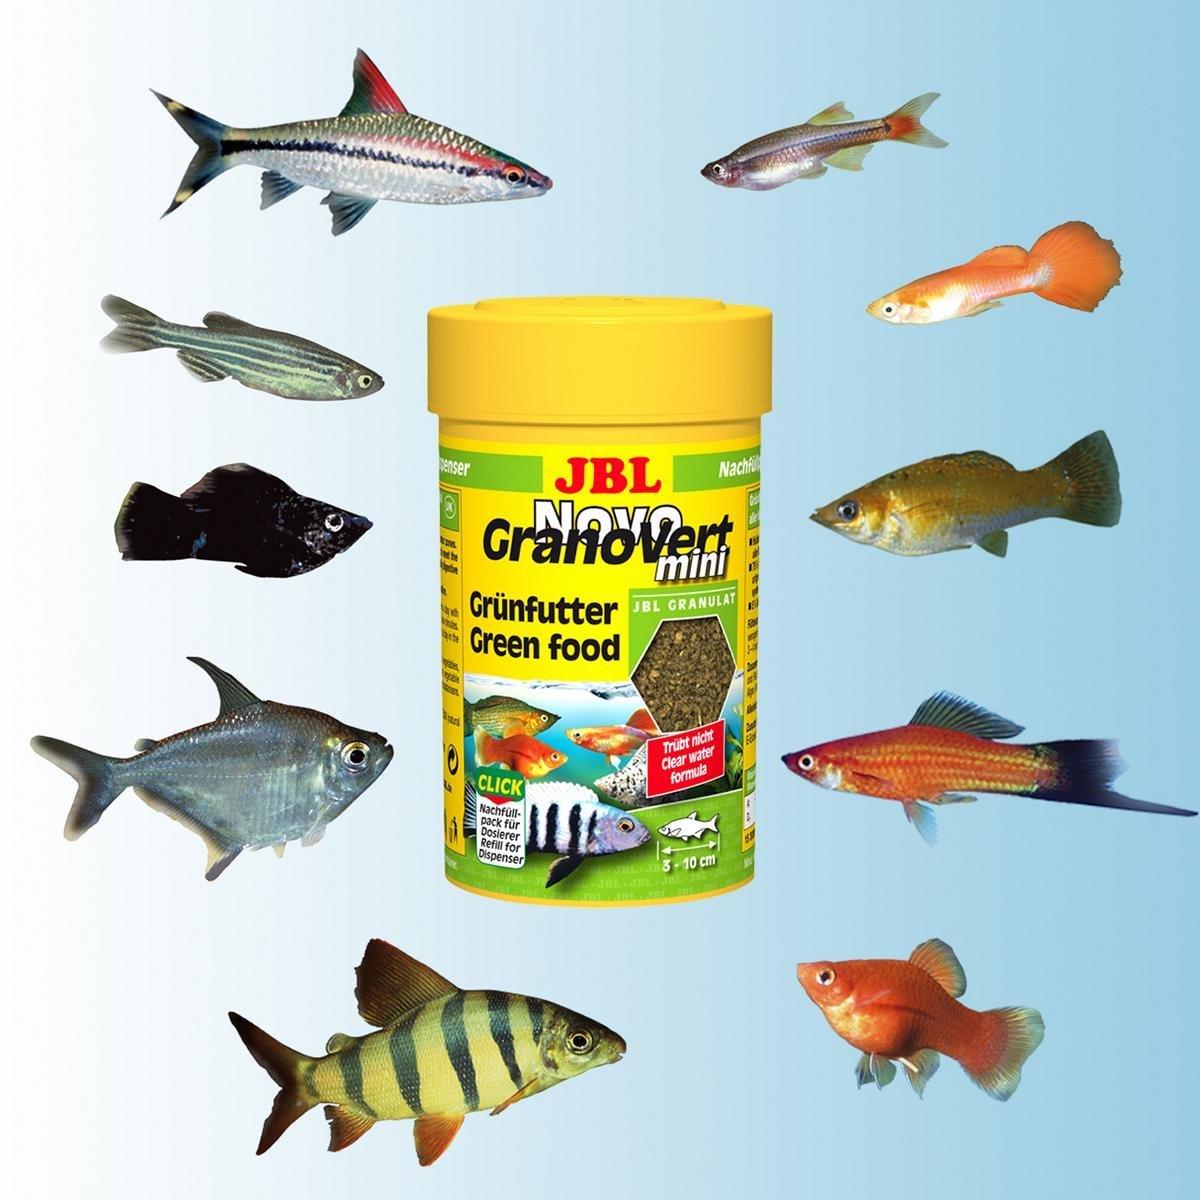 JBL ALIMENTO COMPLETO PARA herbívoro PECES DE ACUARIO,granulado,novogranovert - 100 ml (Click): Amazon.es: Productos para mascotas